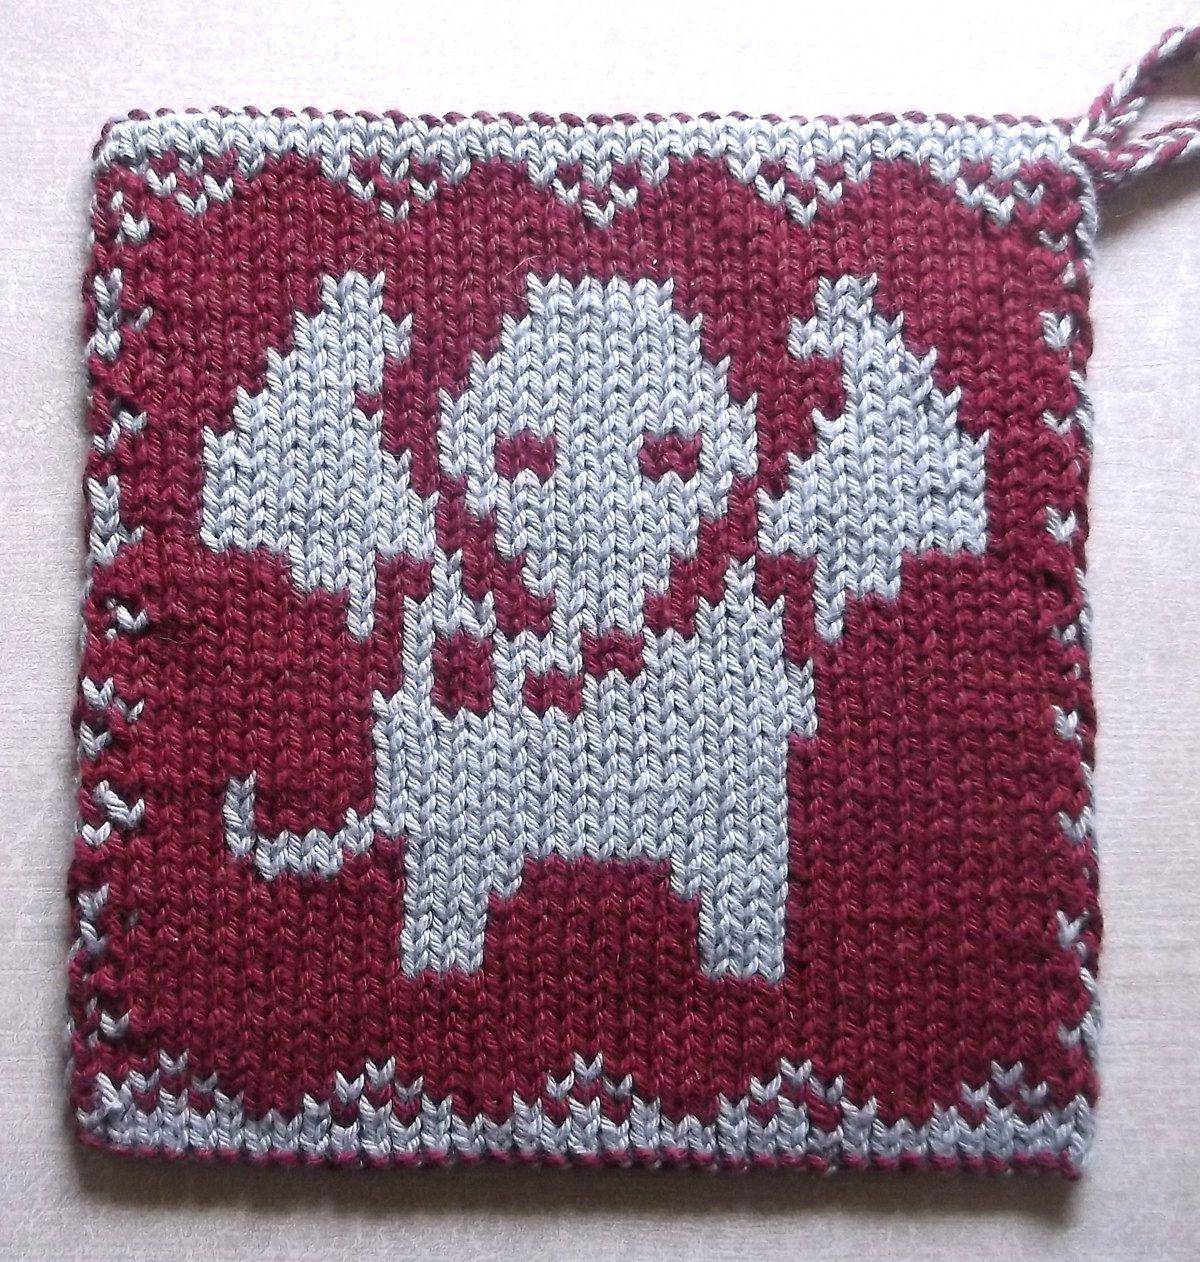 Free knitting pattern for elephant pot holder double knit free knitting pattern for elephant pot holder double knit reversible design with elephant motif that bankloansurffo Images